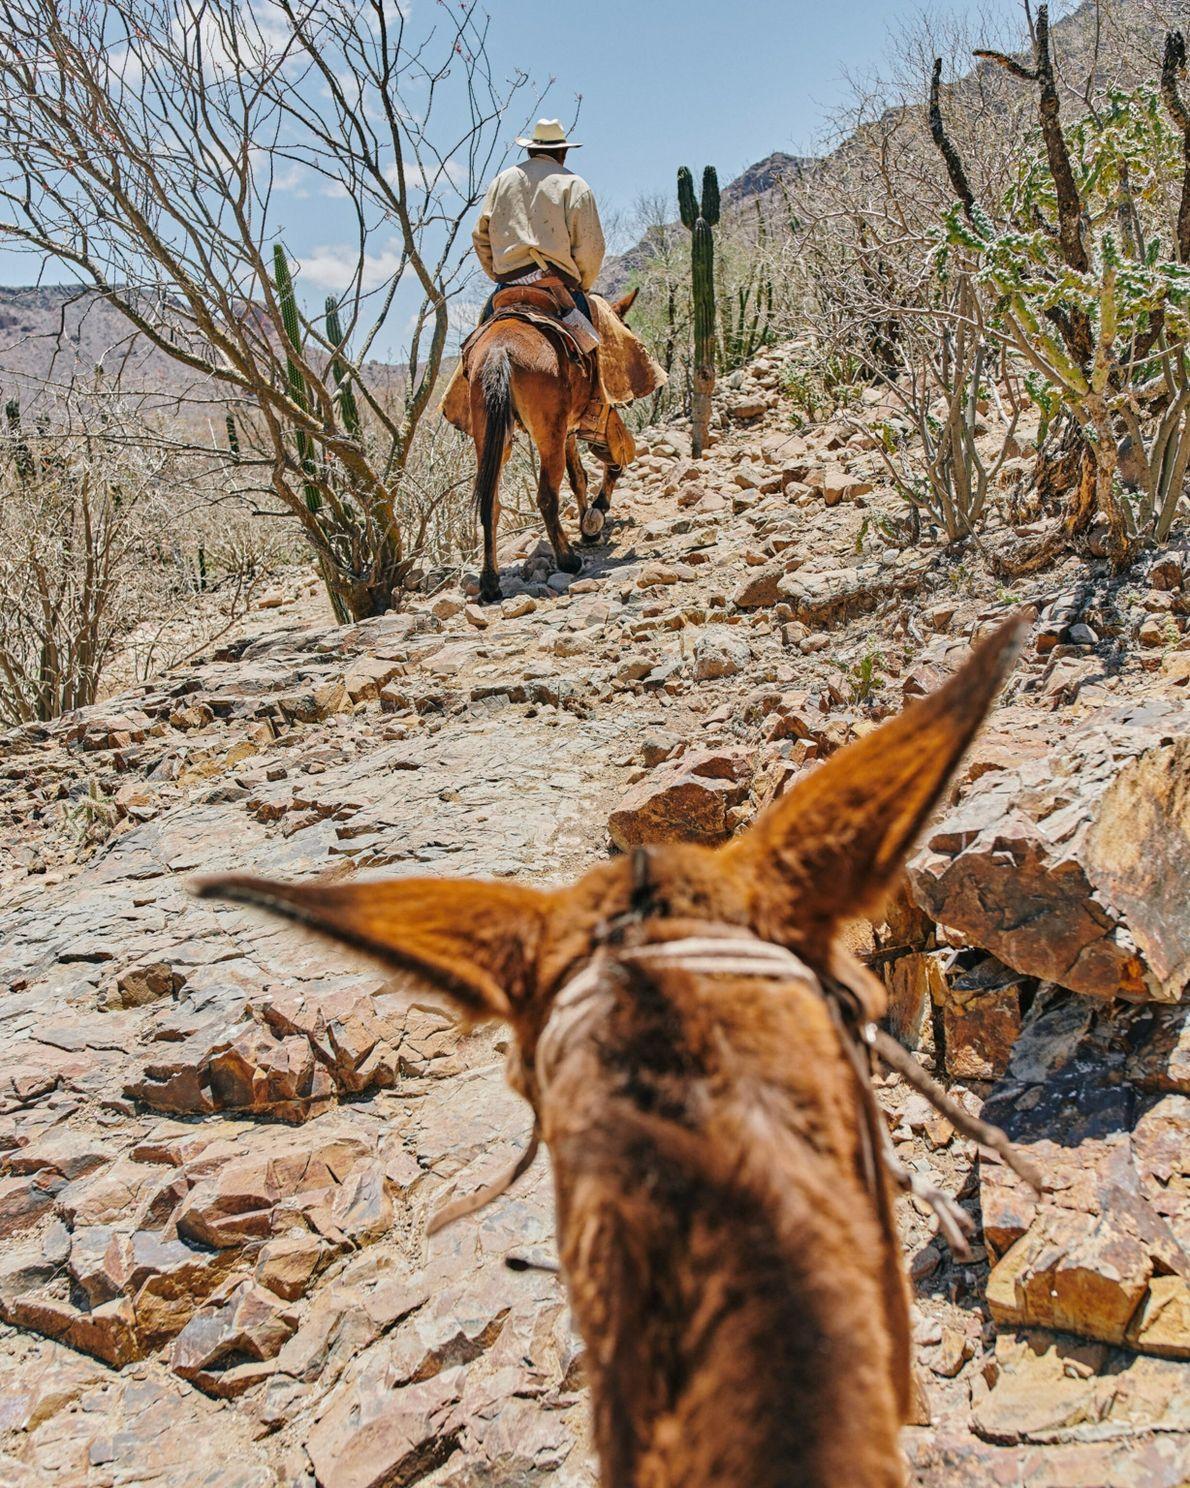 Chevauchant sur le Camino Real, Ignacio Arce Arce, dit « Nacho », passe à proximité du Rancho Aguajito de las Mujeres ...